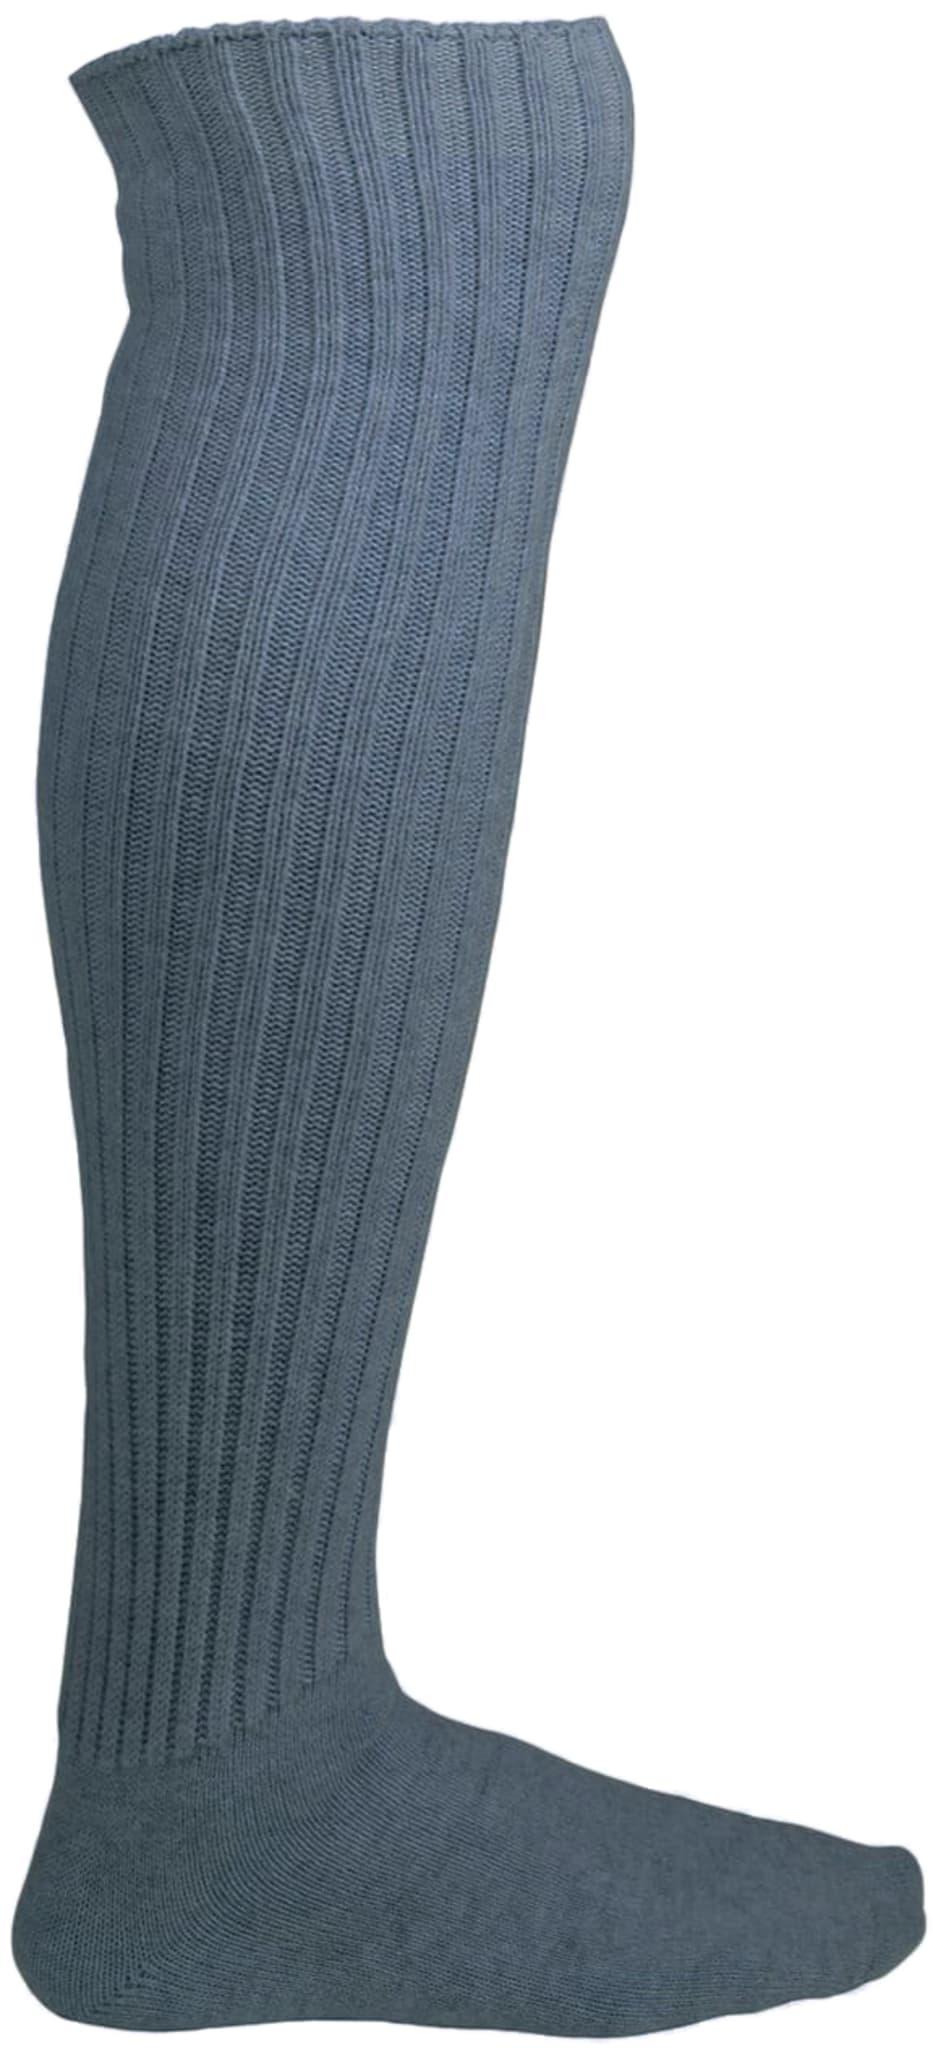 Vagabond Sock Unisex